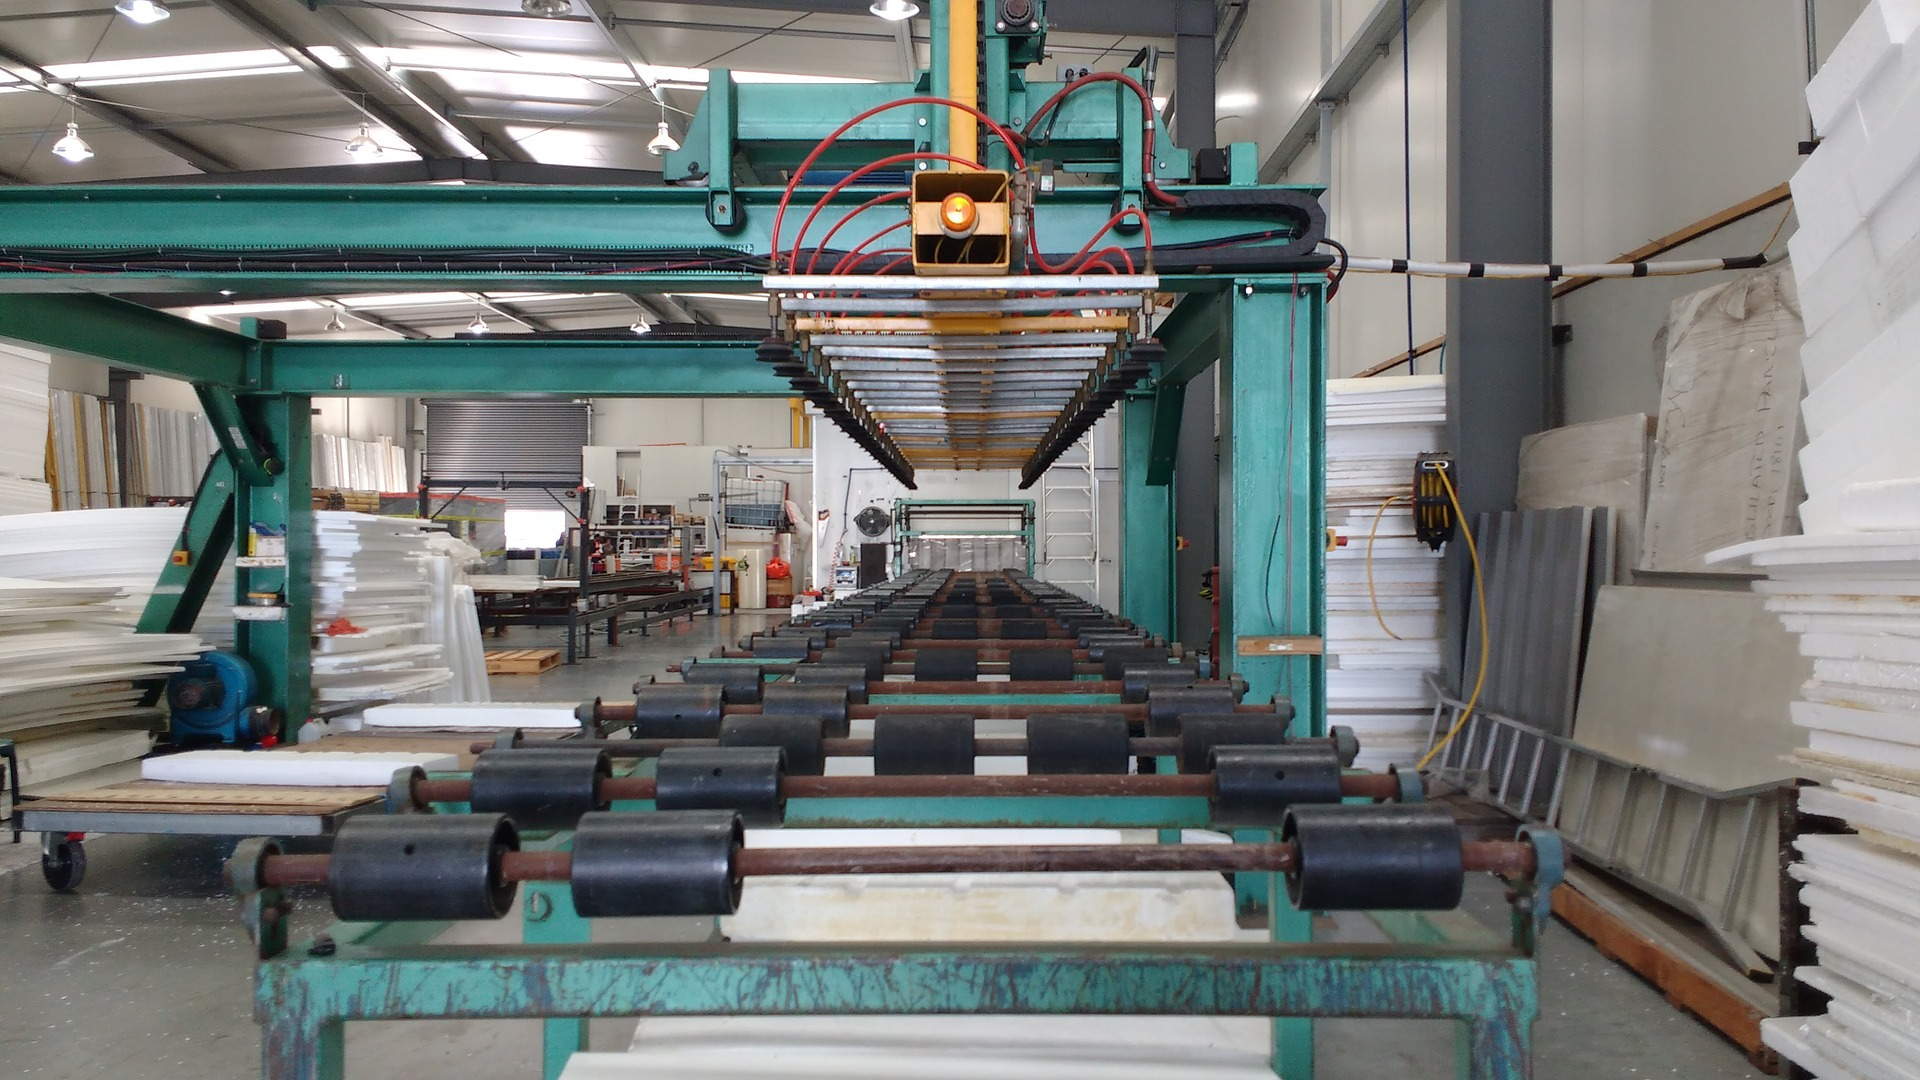 factory-1516381_1920